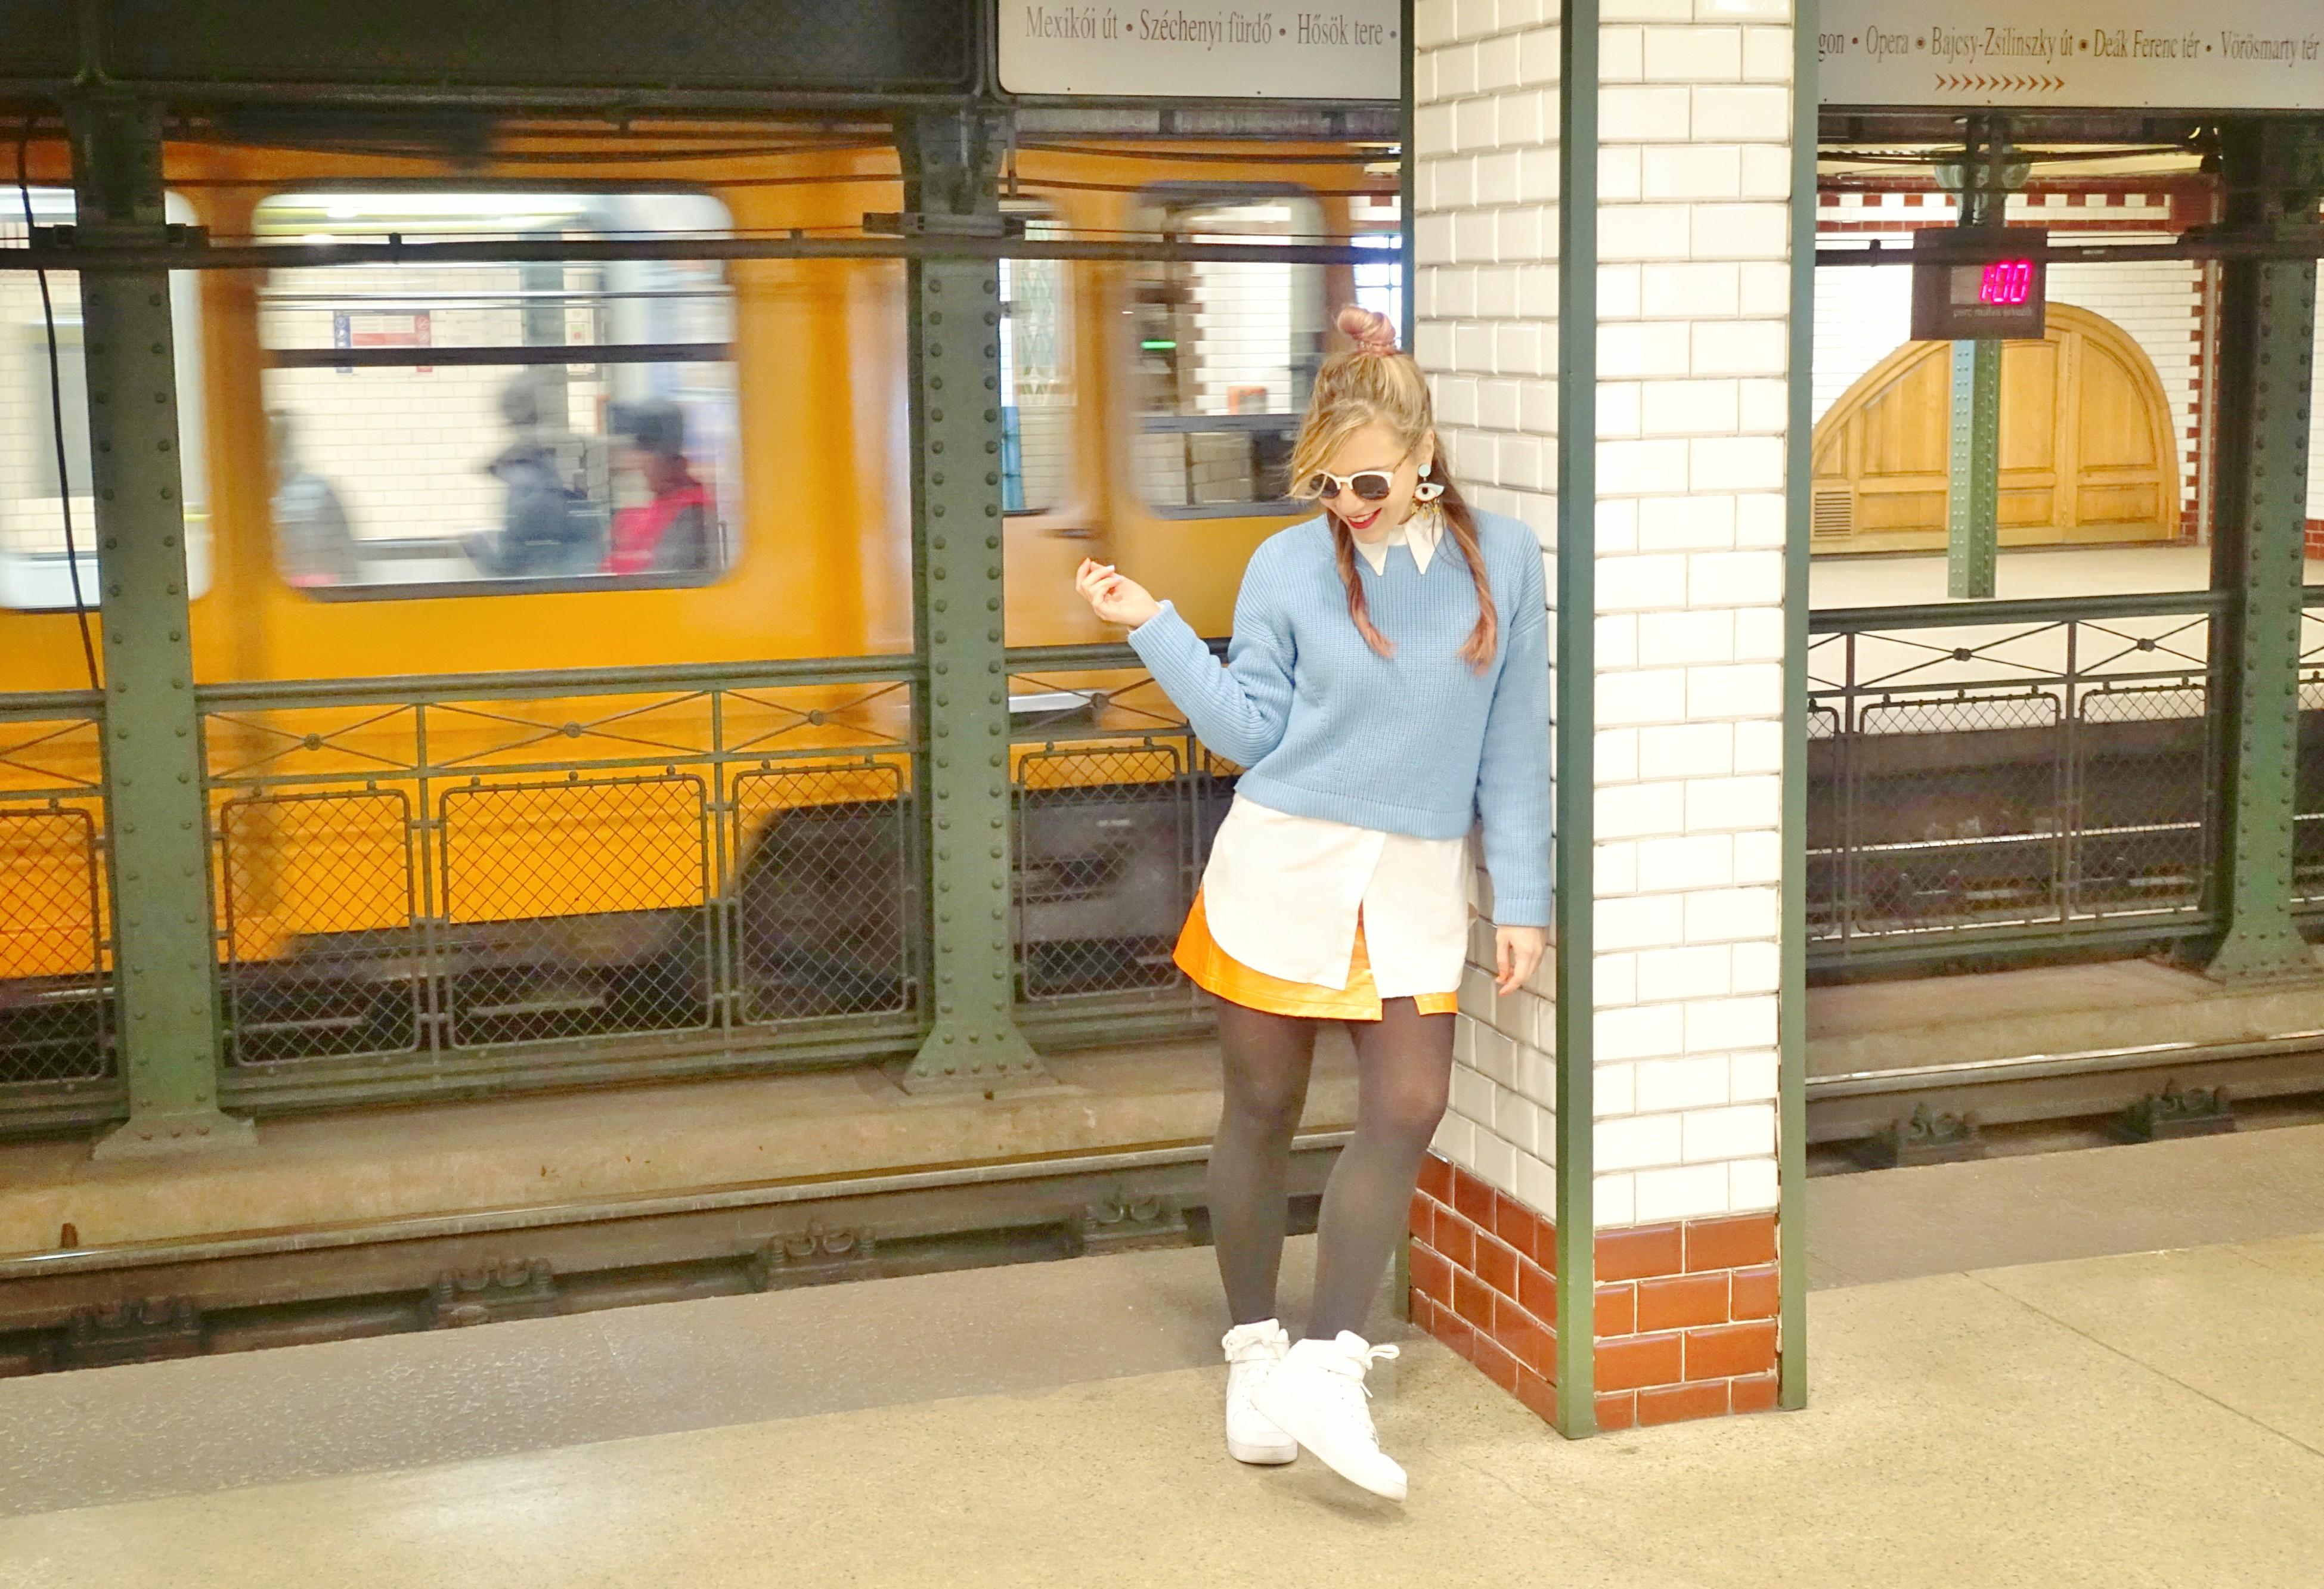 Que-ver-en-budapest-blog-de-moda-chic-adicta-street-style-influencer-chicadicta-kling-outfit-PiensaenChic-piensa-en-Chic